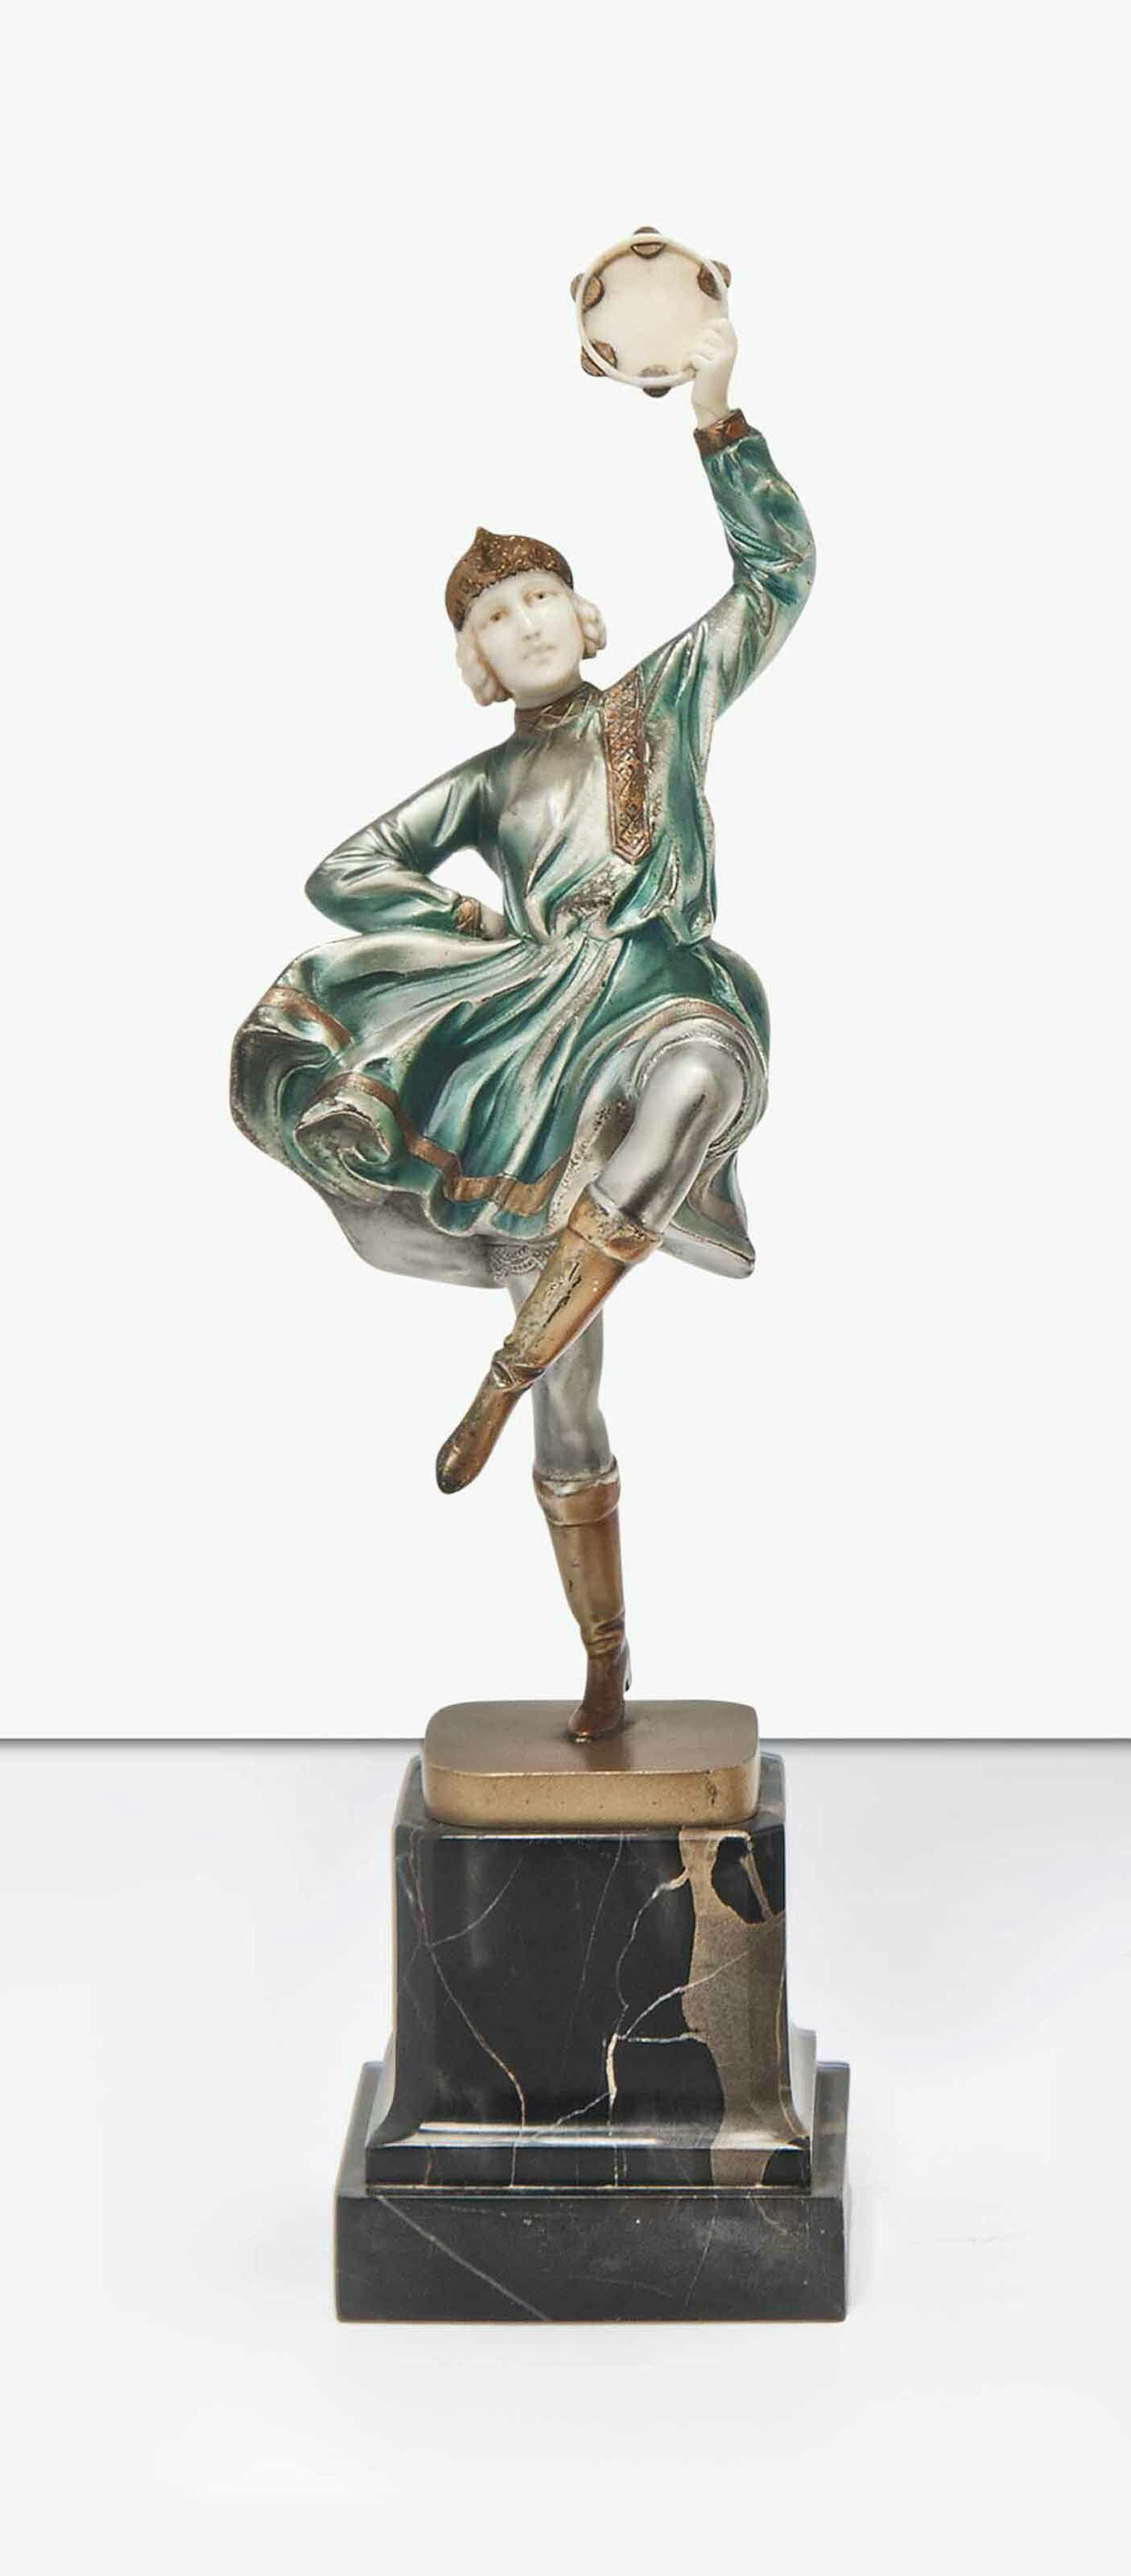 A FERDINAND PREISS (1882-1943) GILT-BRONZE AND IVORY FIGURE